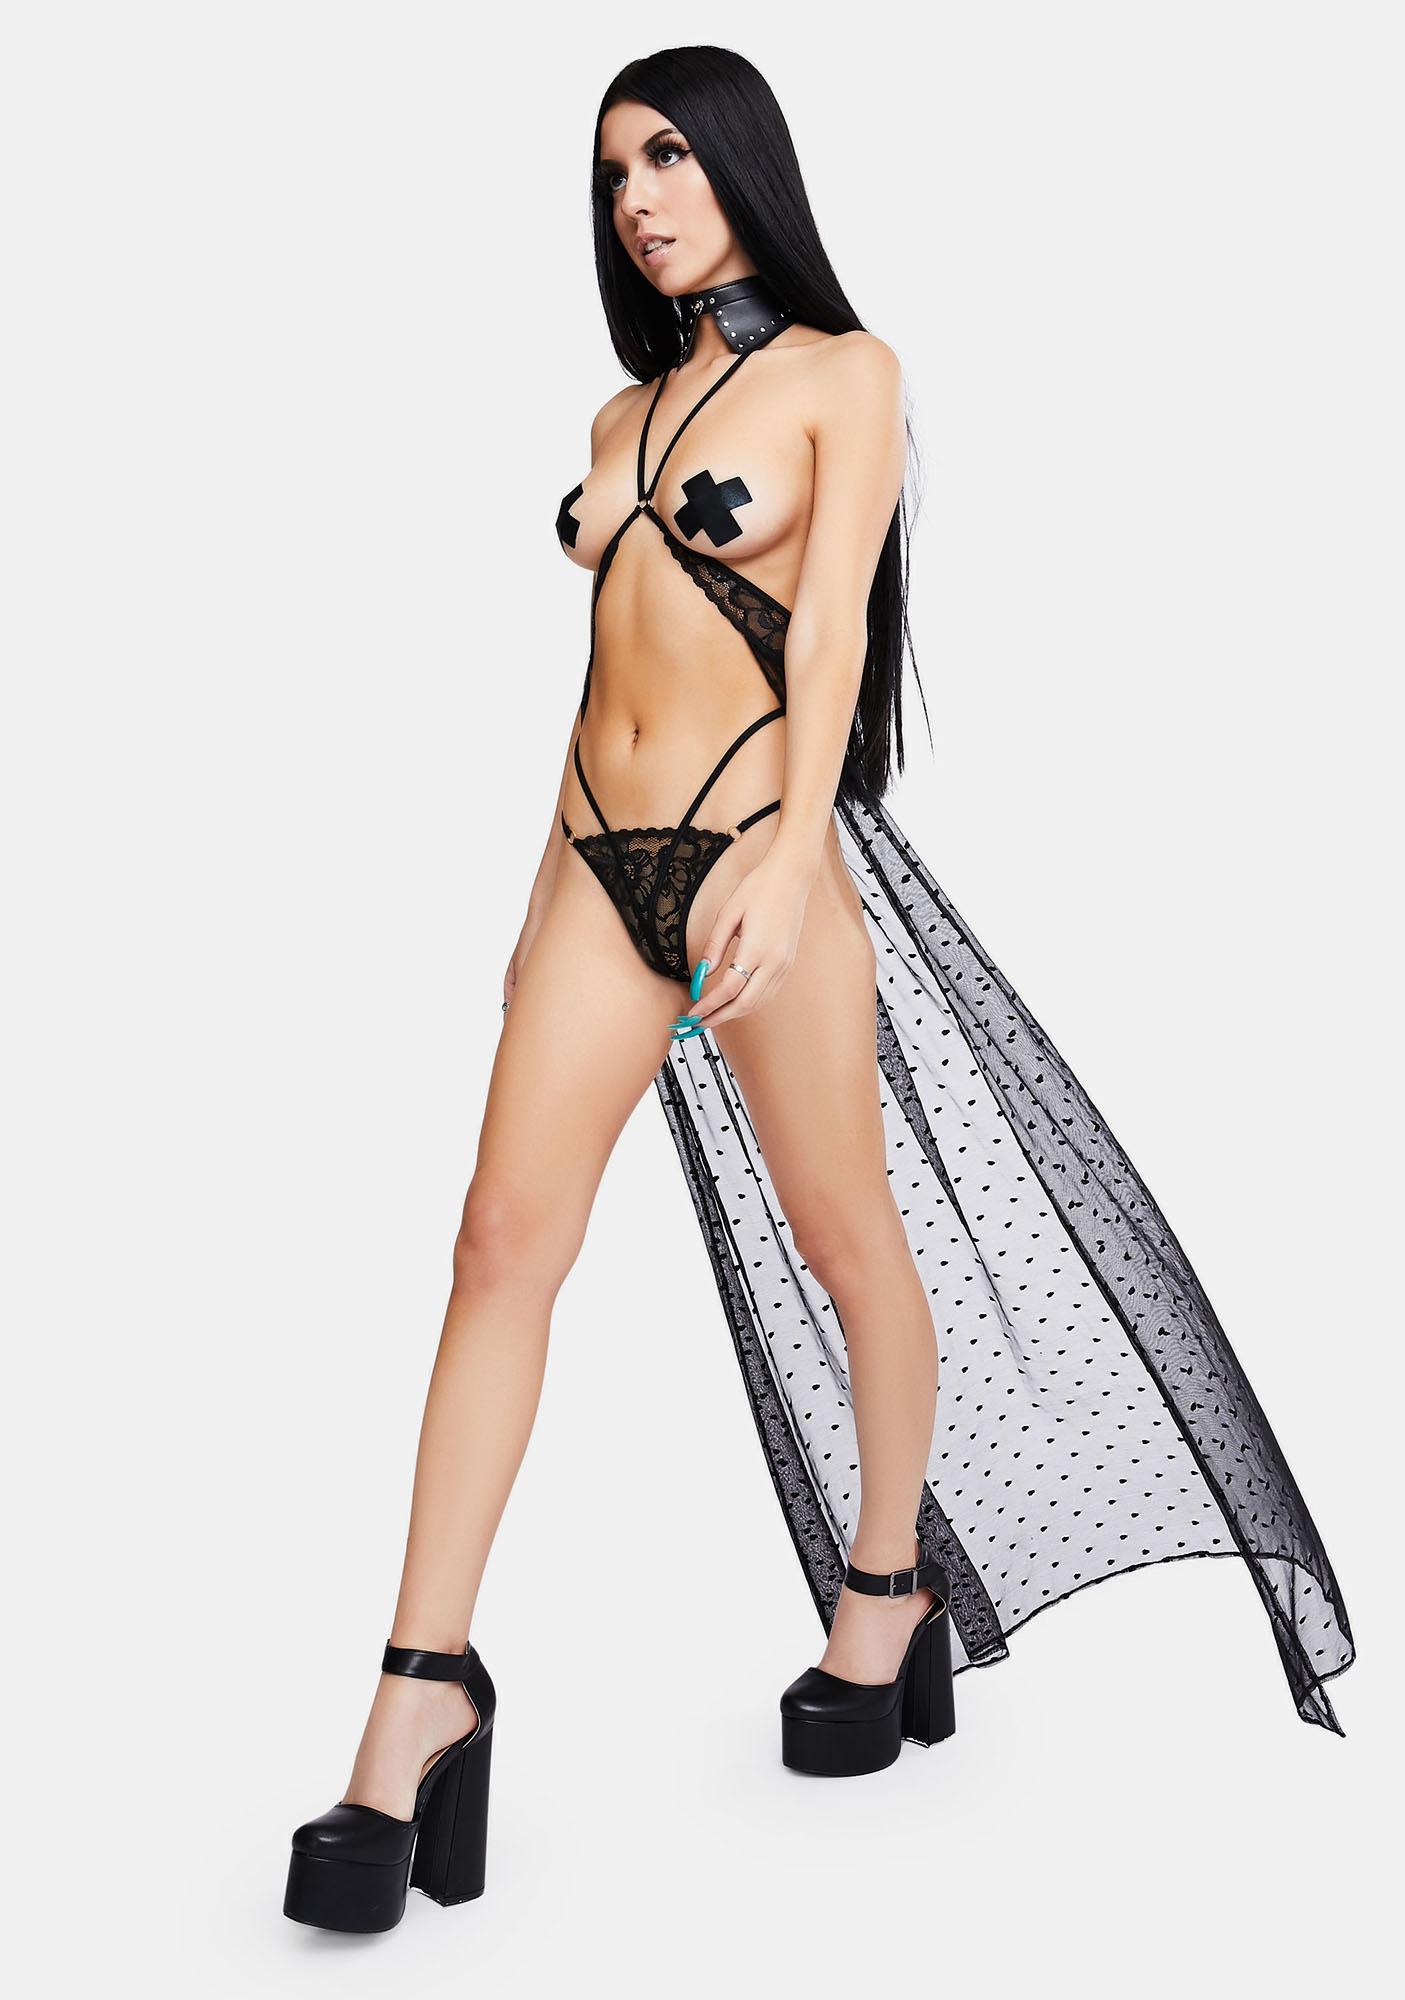 Sensual Favorite Nightgown Lingerie Set